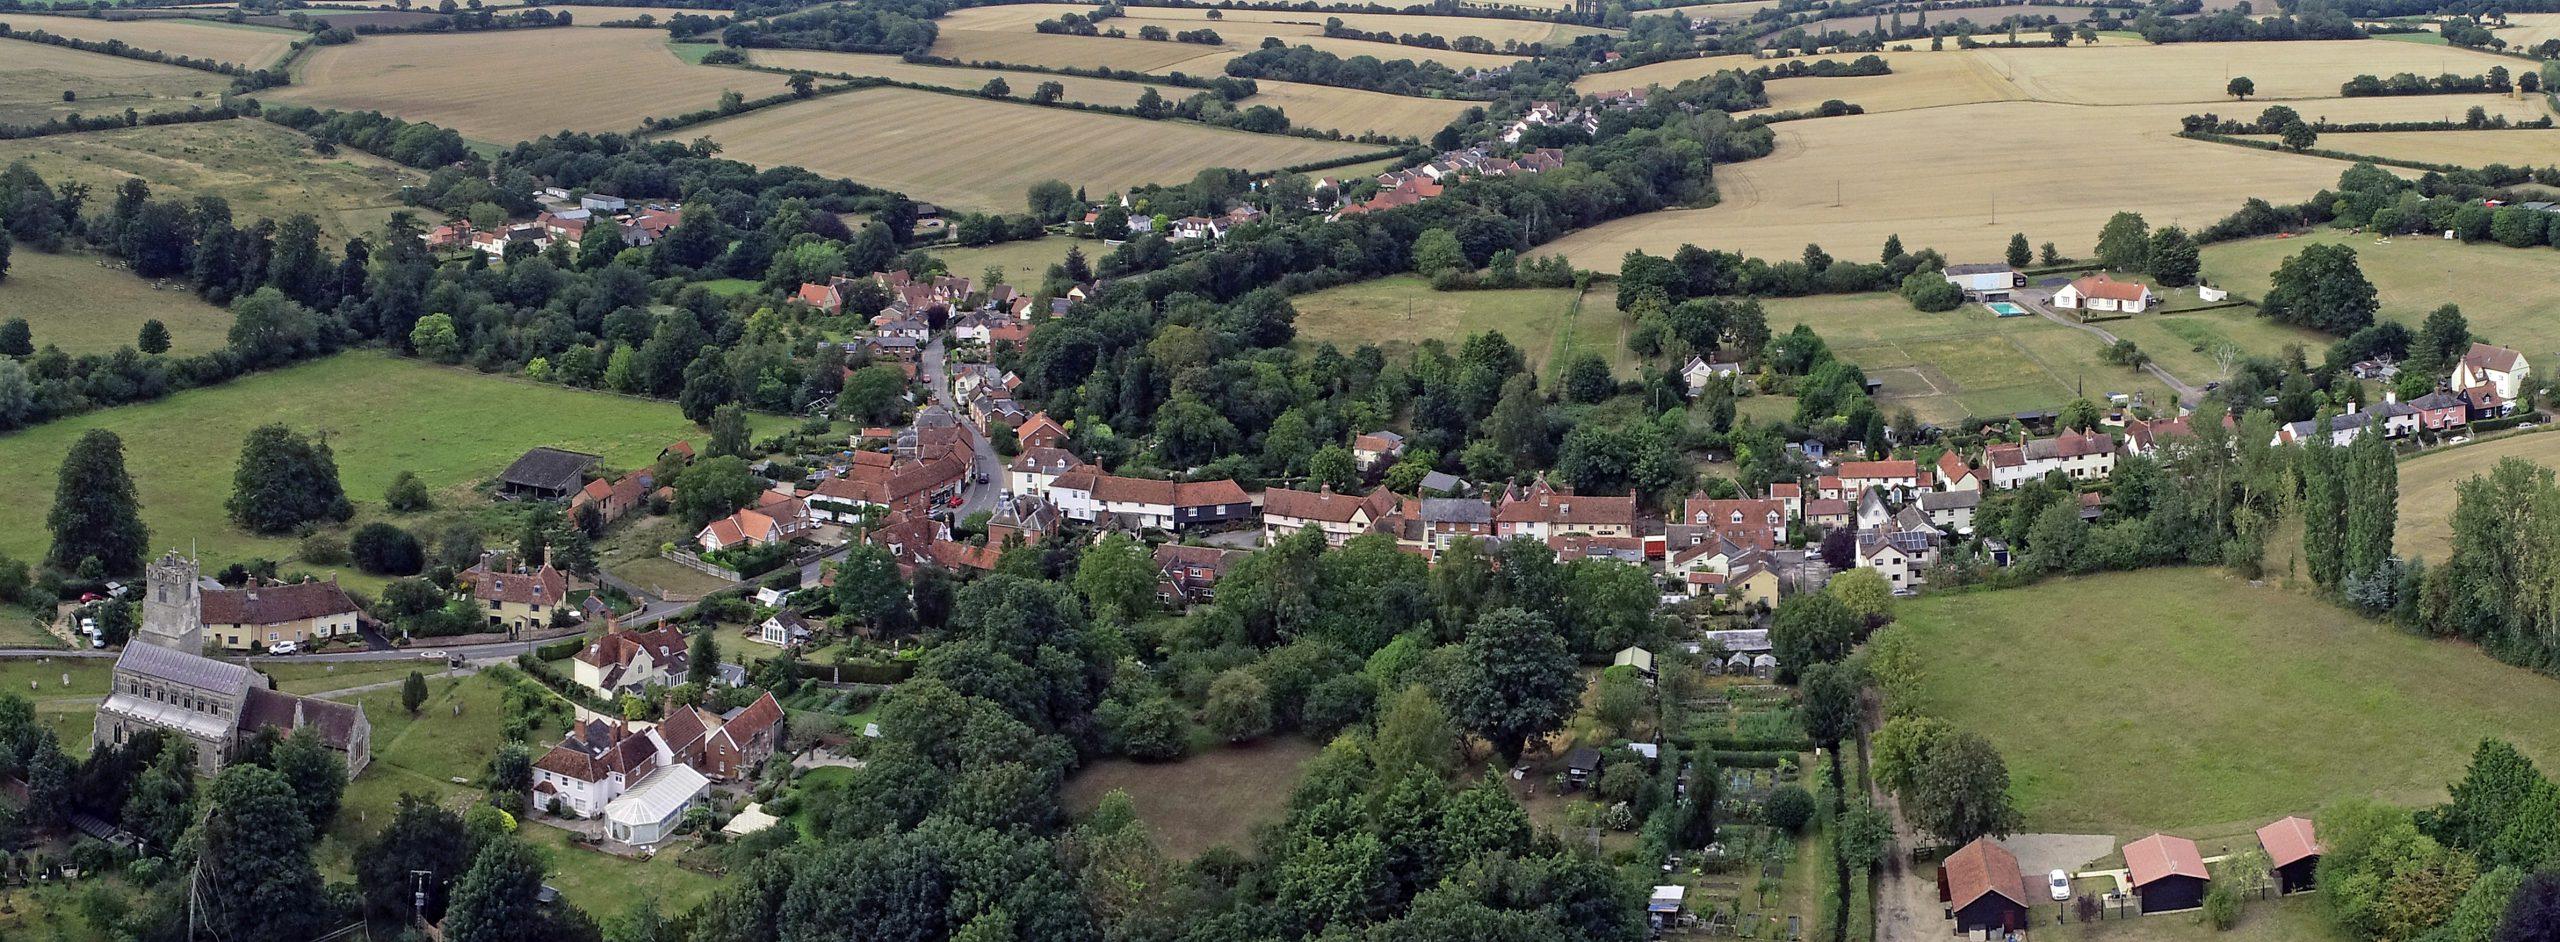 Aerial View of Coddenham